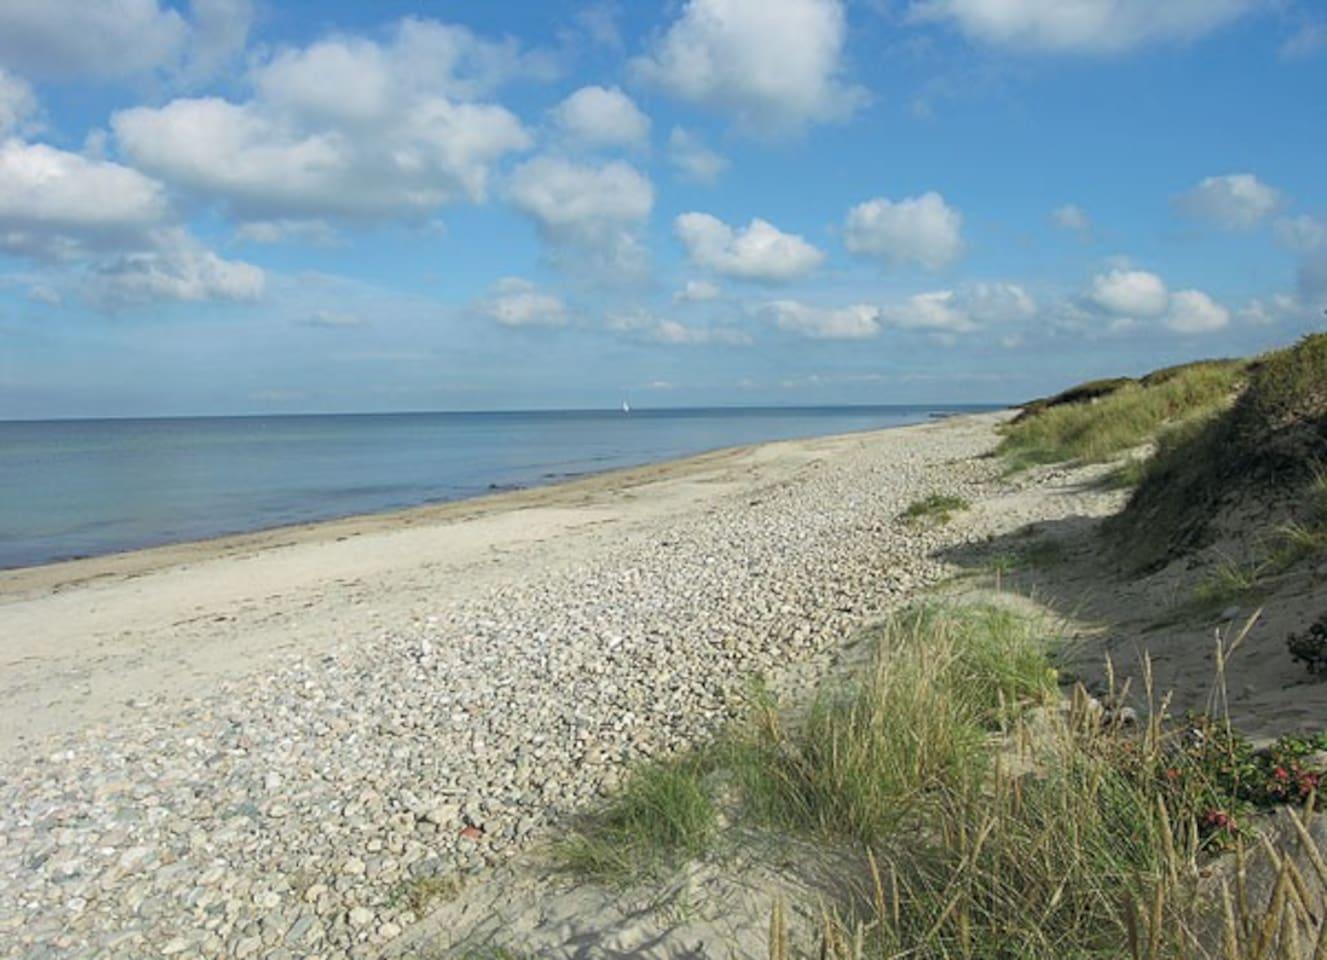 Udsholt Strand